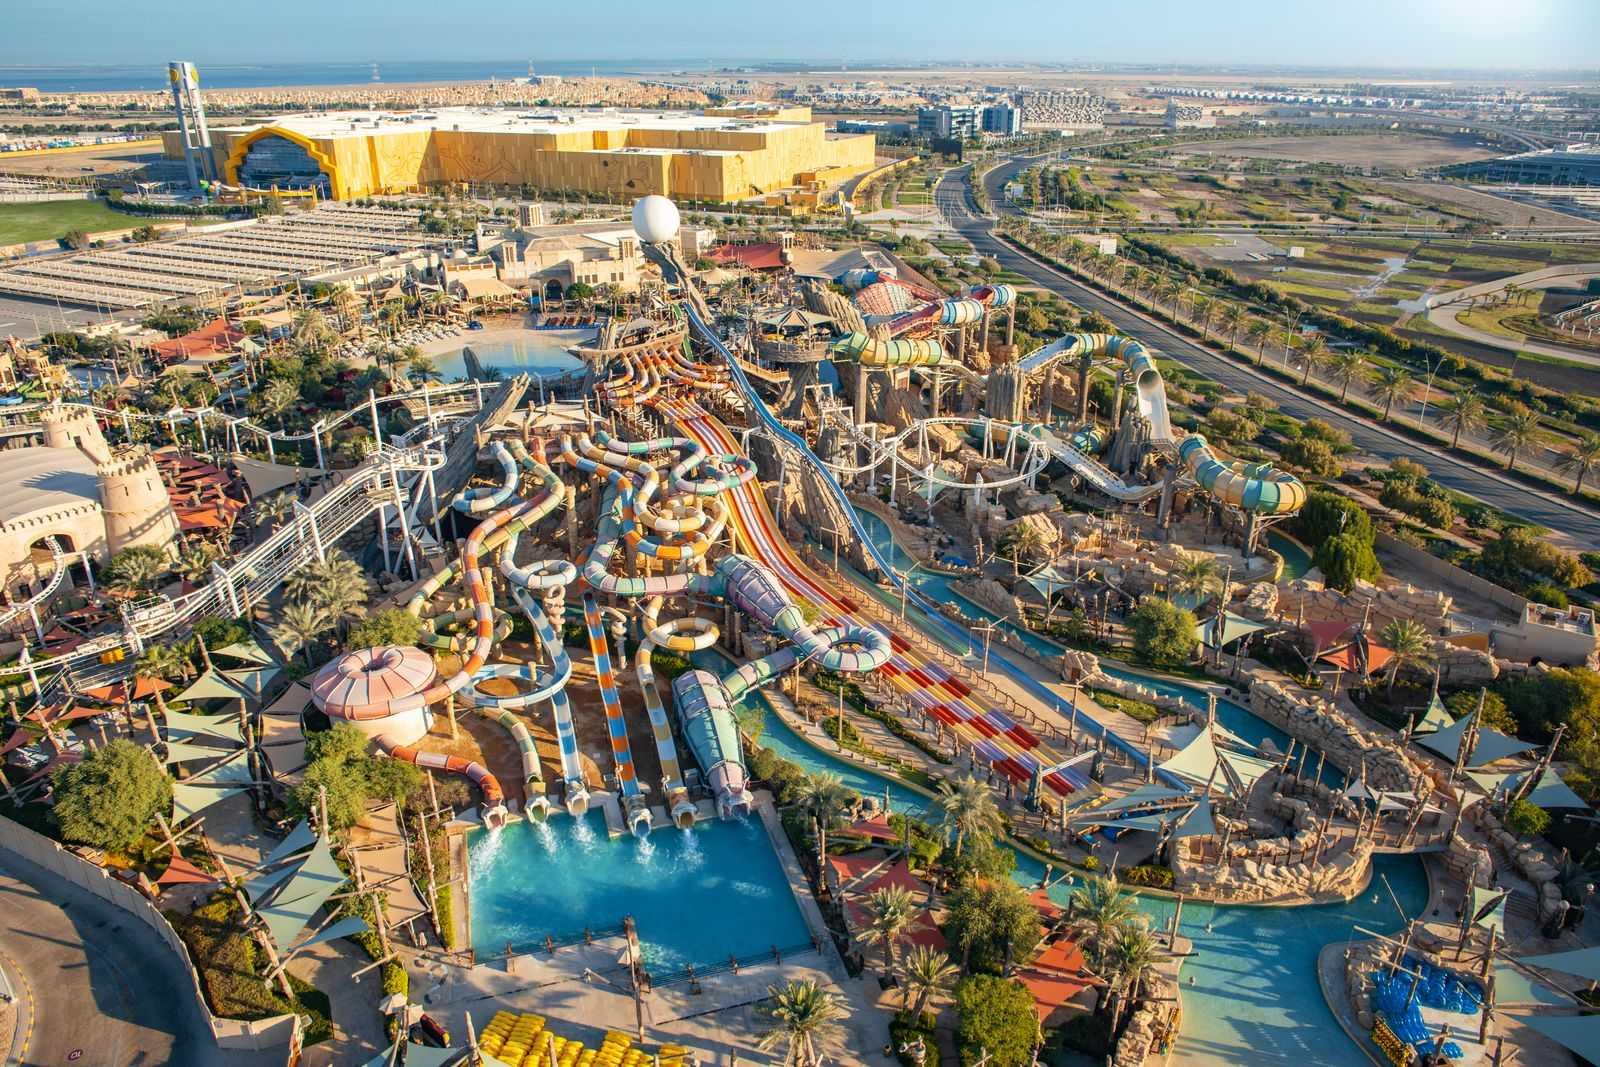 Yas Waterworld and Warner Bros. World Abu Dhabi overview